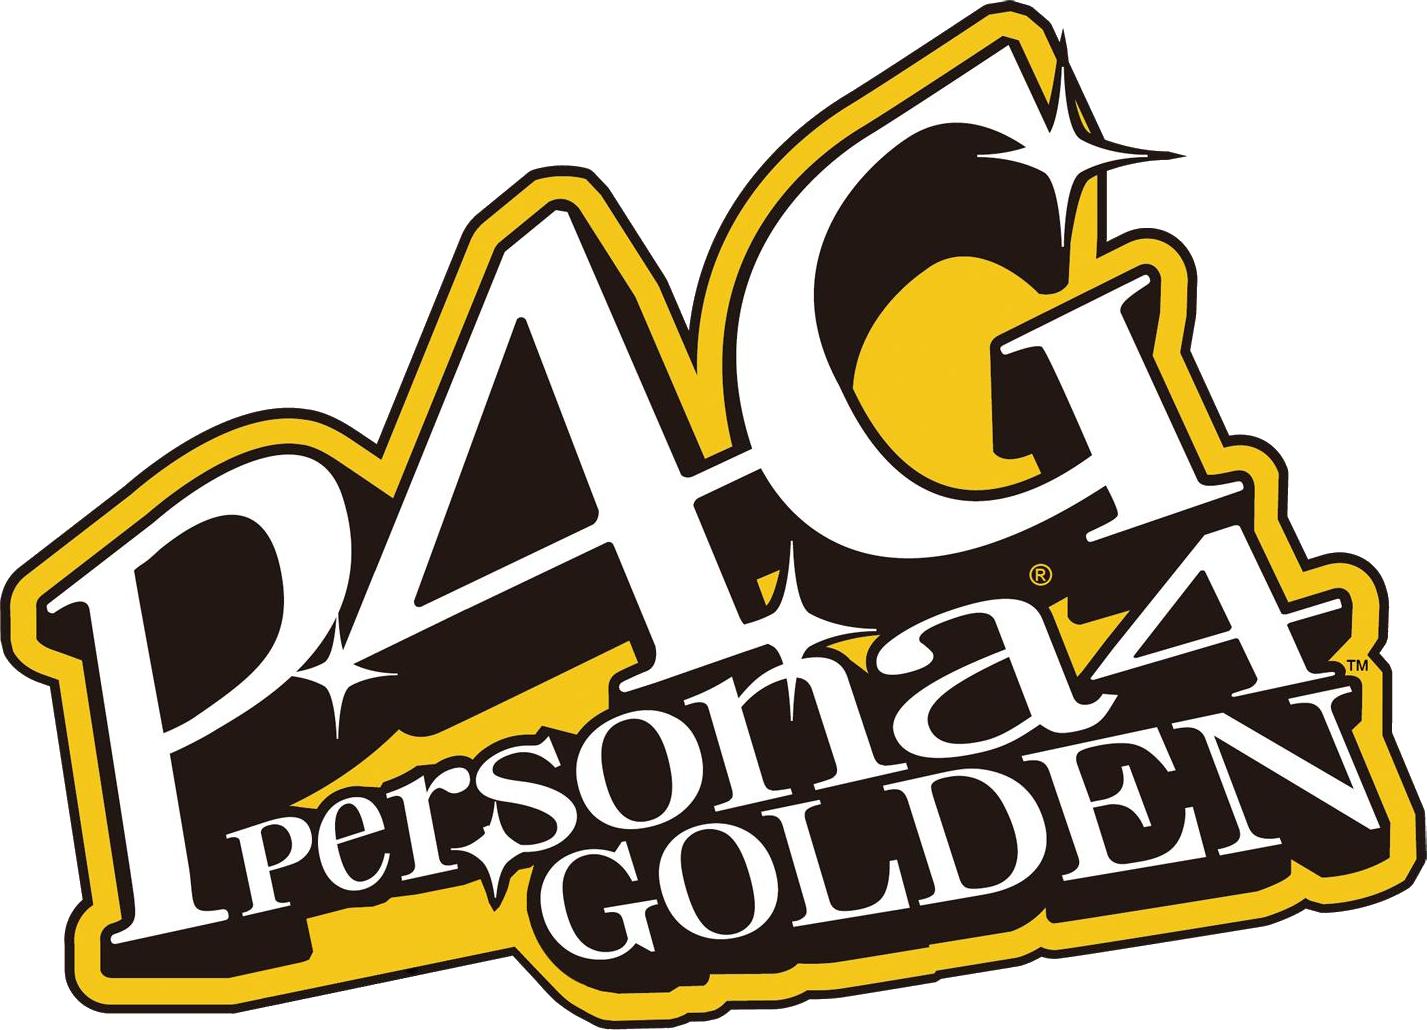 Persona 4 Golden | Megami Tensei Wiki | FANDOM powered by Wikia